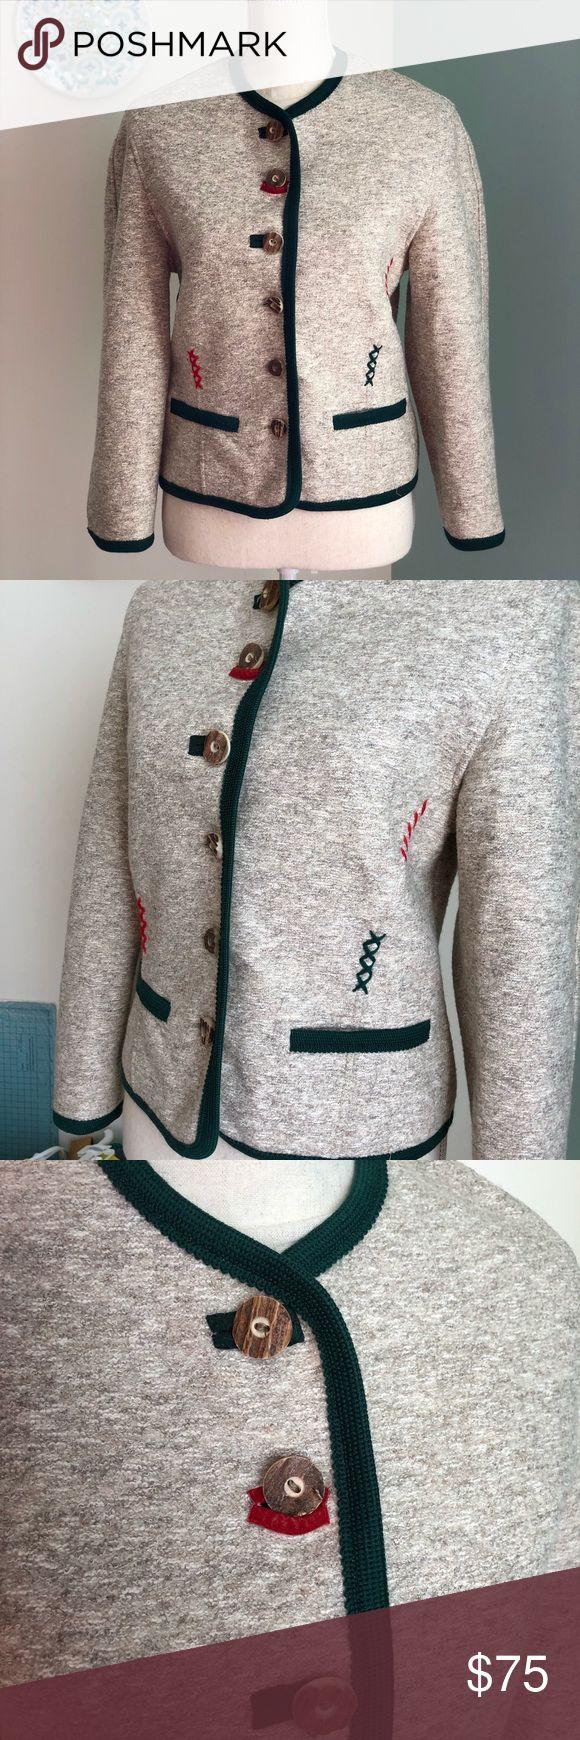 Giesswein wool jacket size 4 Giesswein made in Austria button jacket with wood-look buttons and green trim. Eu size 36/ US 4 Giesswein Jackets & Coats